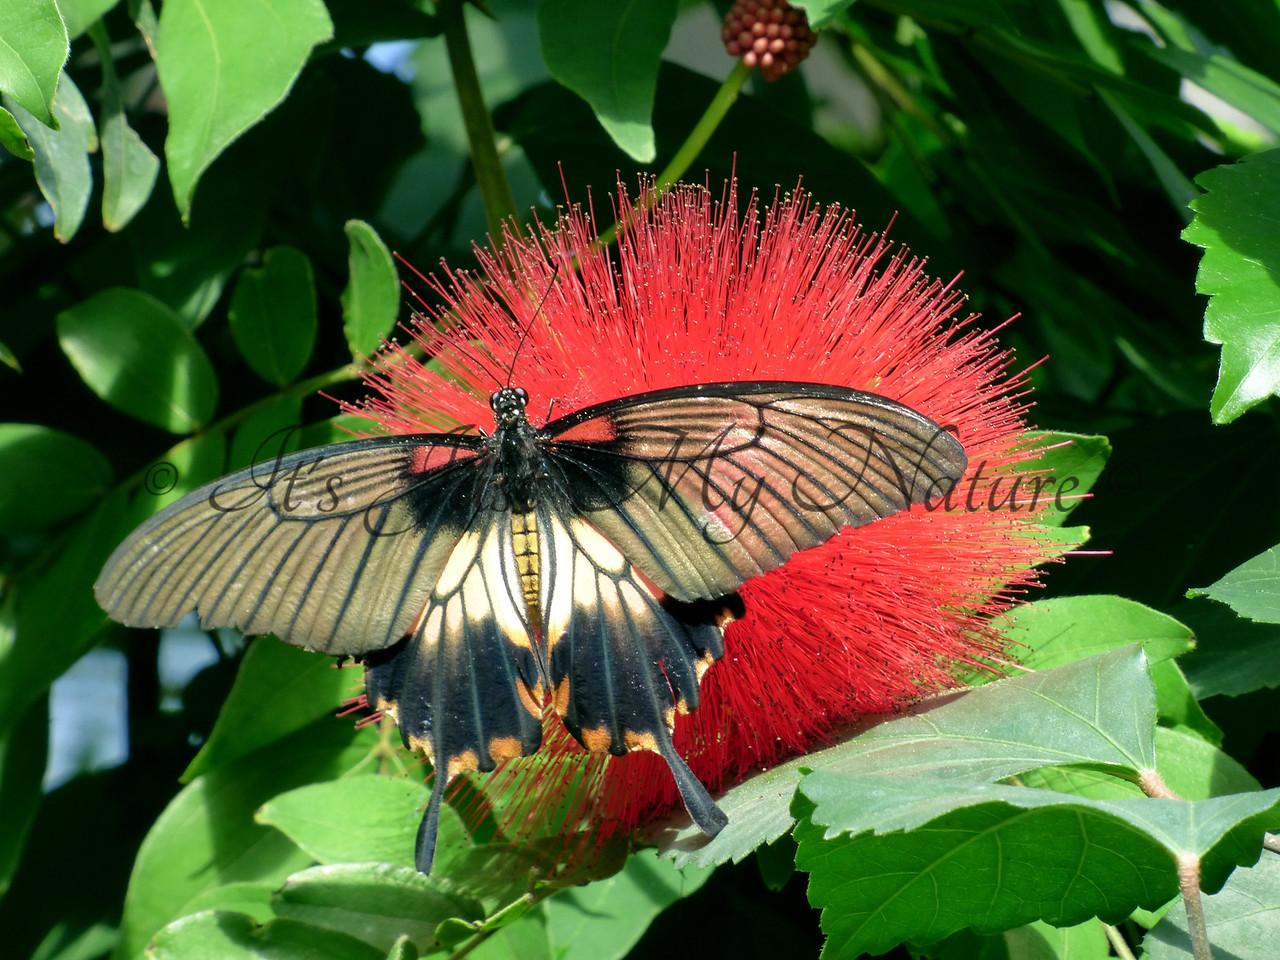 Lowii Swallowtail on Calliandra